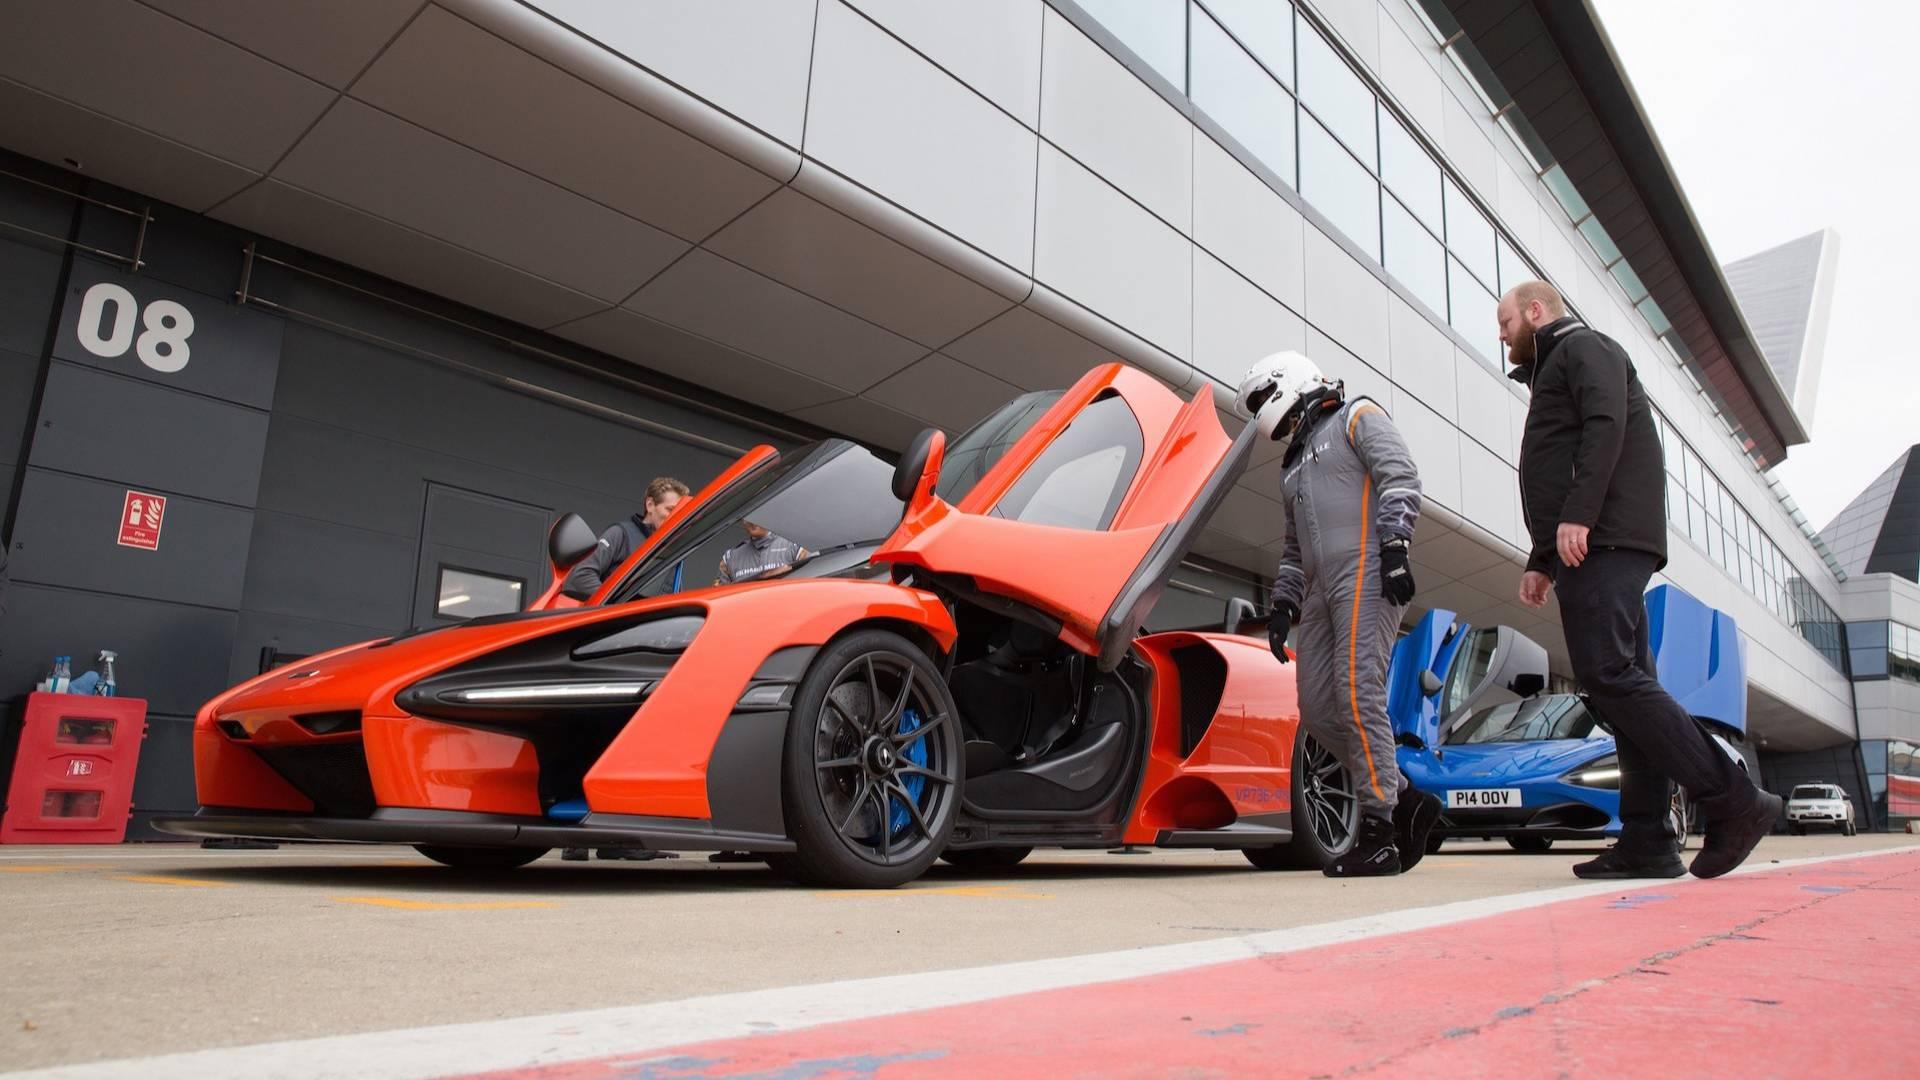 McLaren Senna: First ride